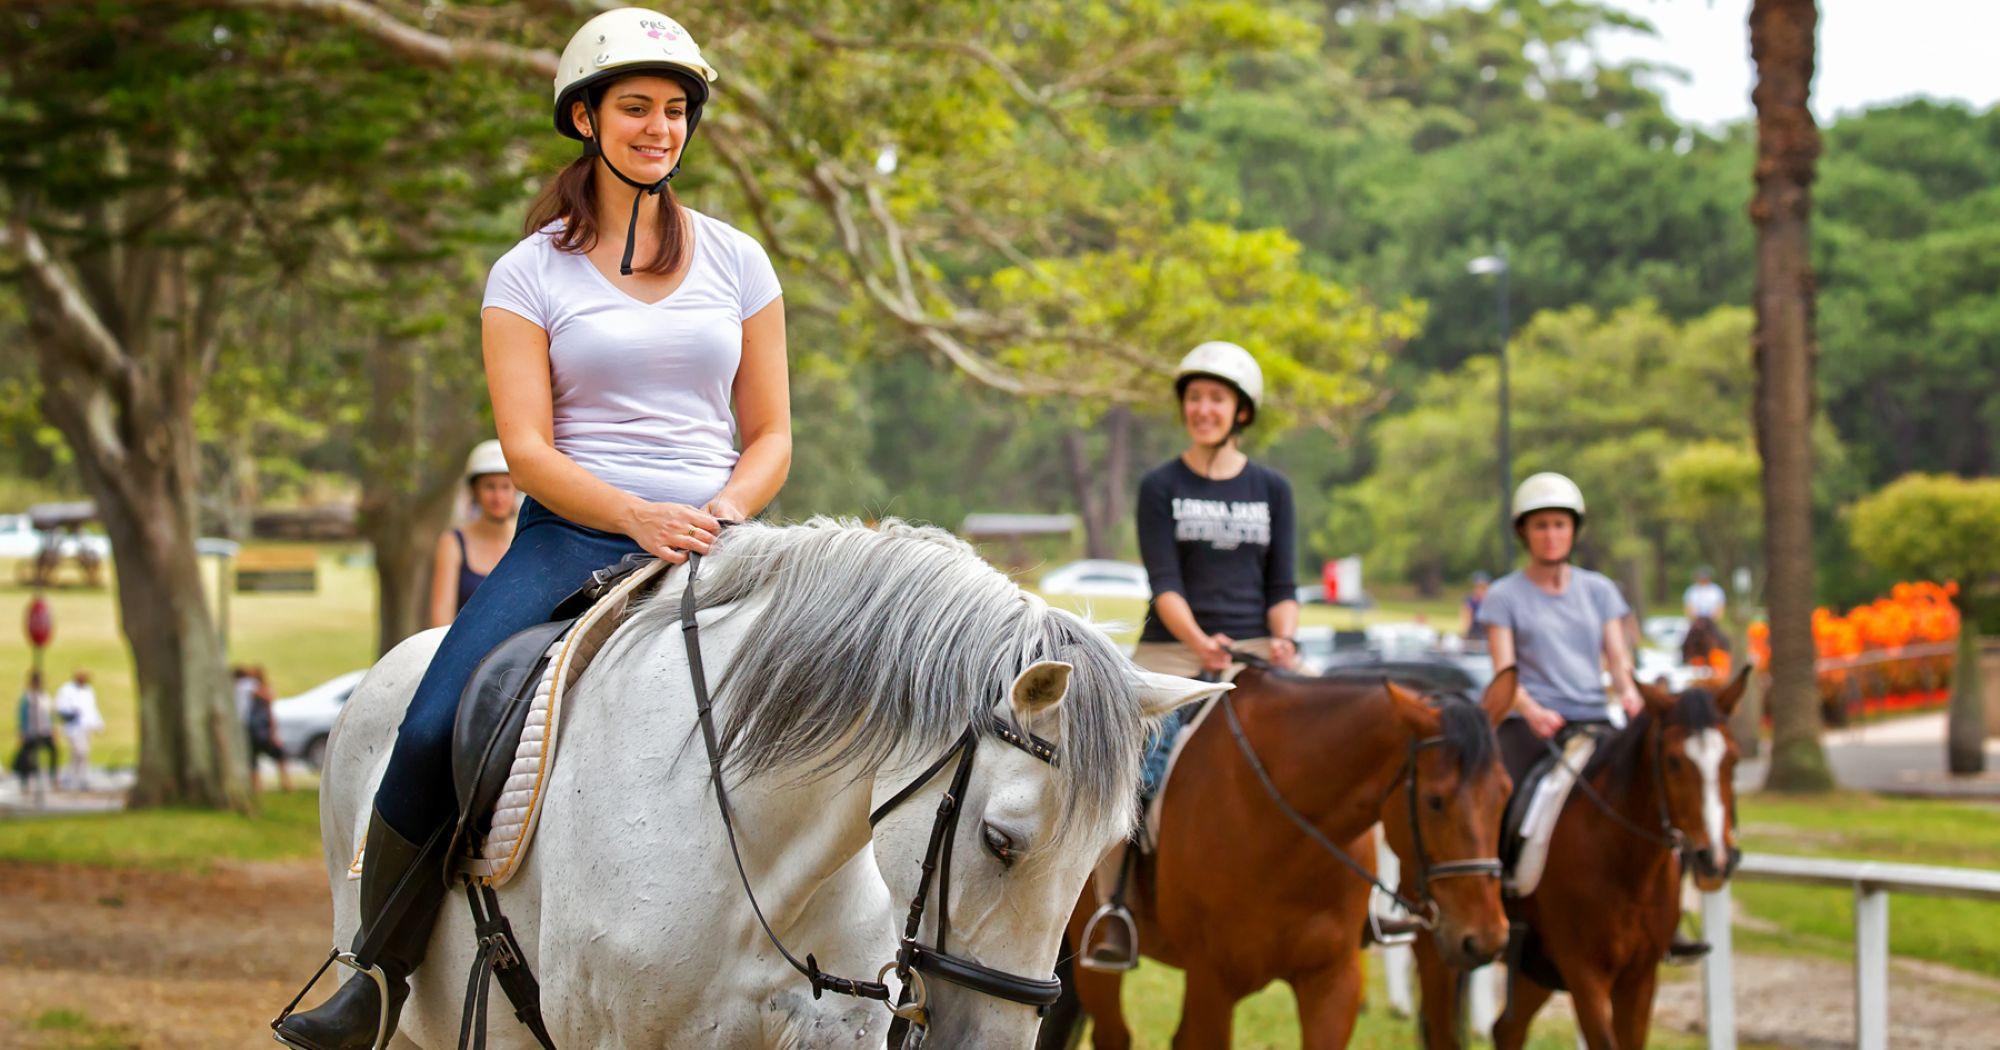 Rideundervisning V. Simone